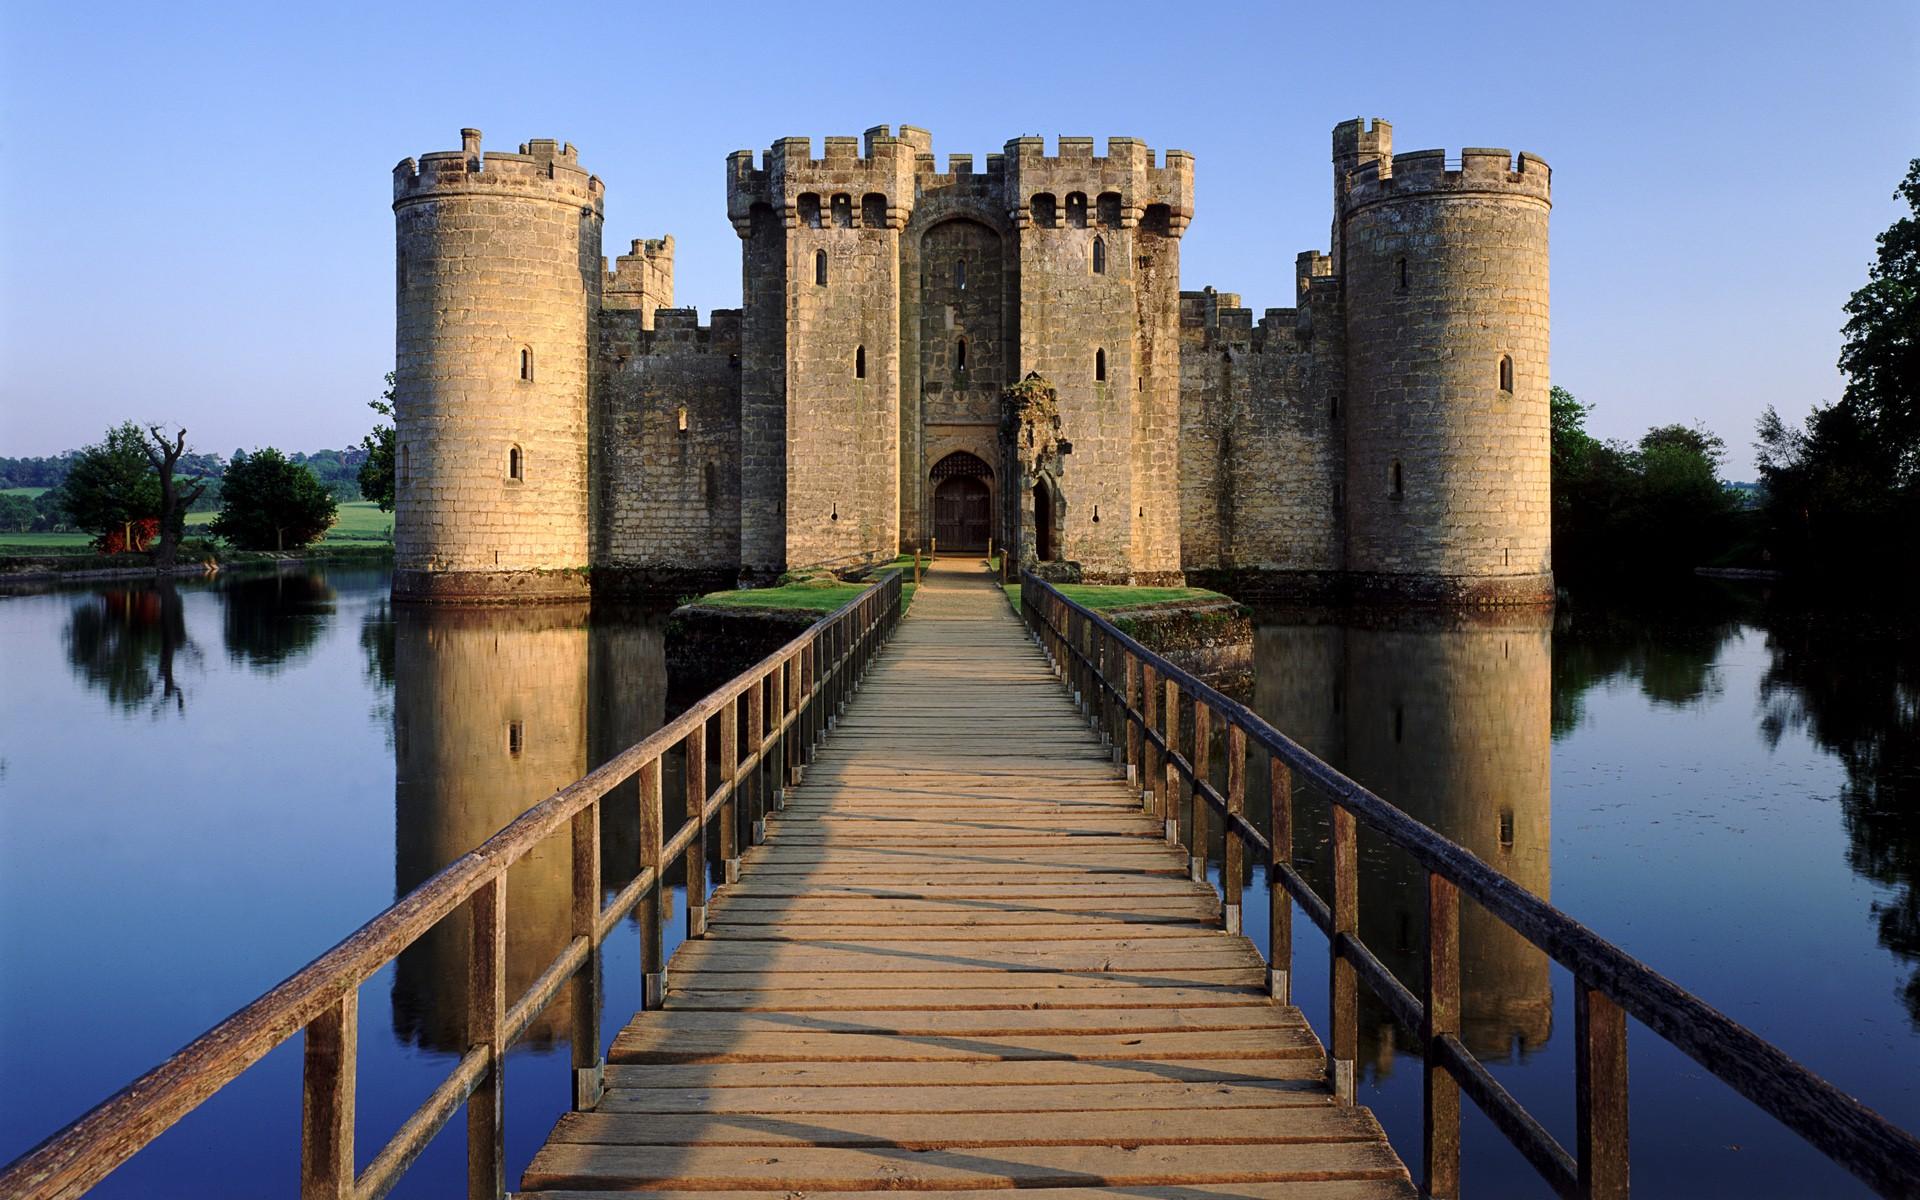 El castillo Bodia en Inglaterra - 1920x1200